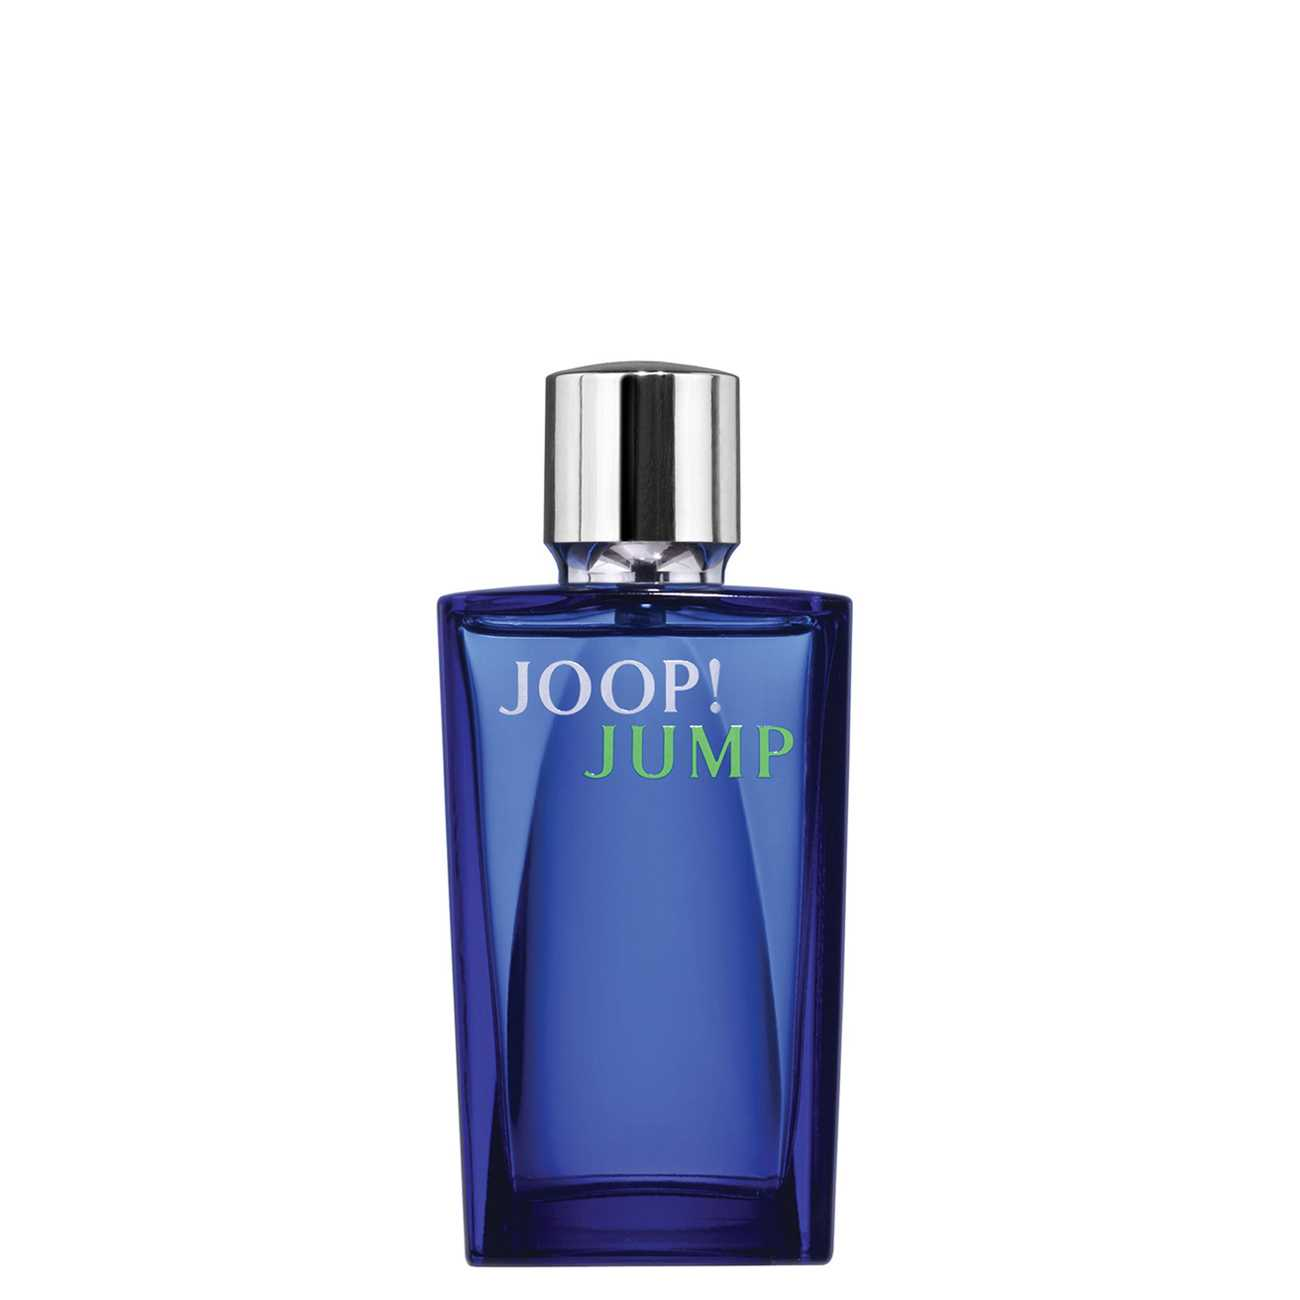 Jump 50 Ml 50ml JOOP! imagine 2021 bestvalue.eu